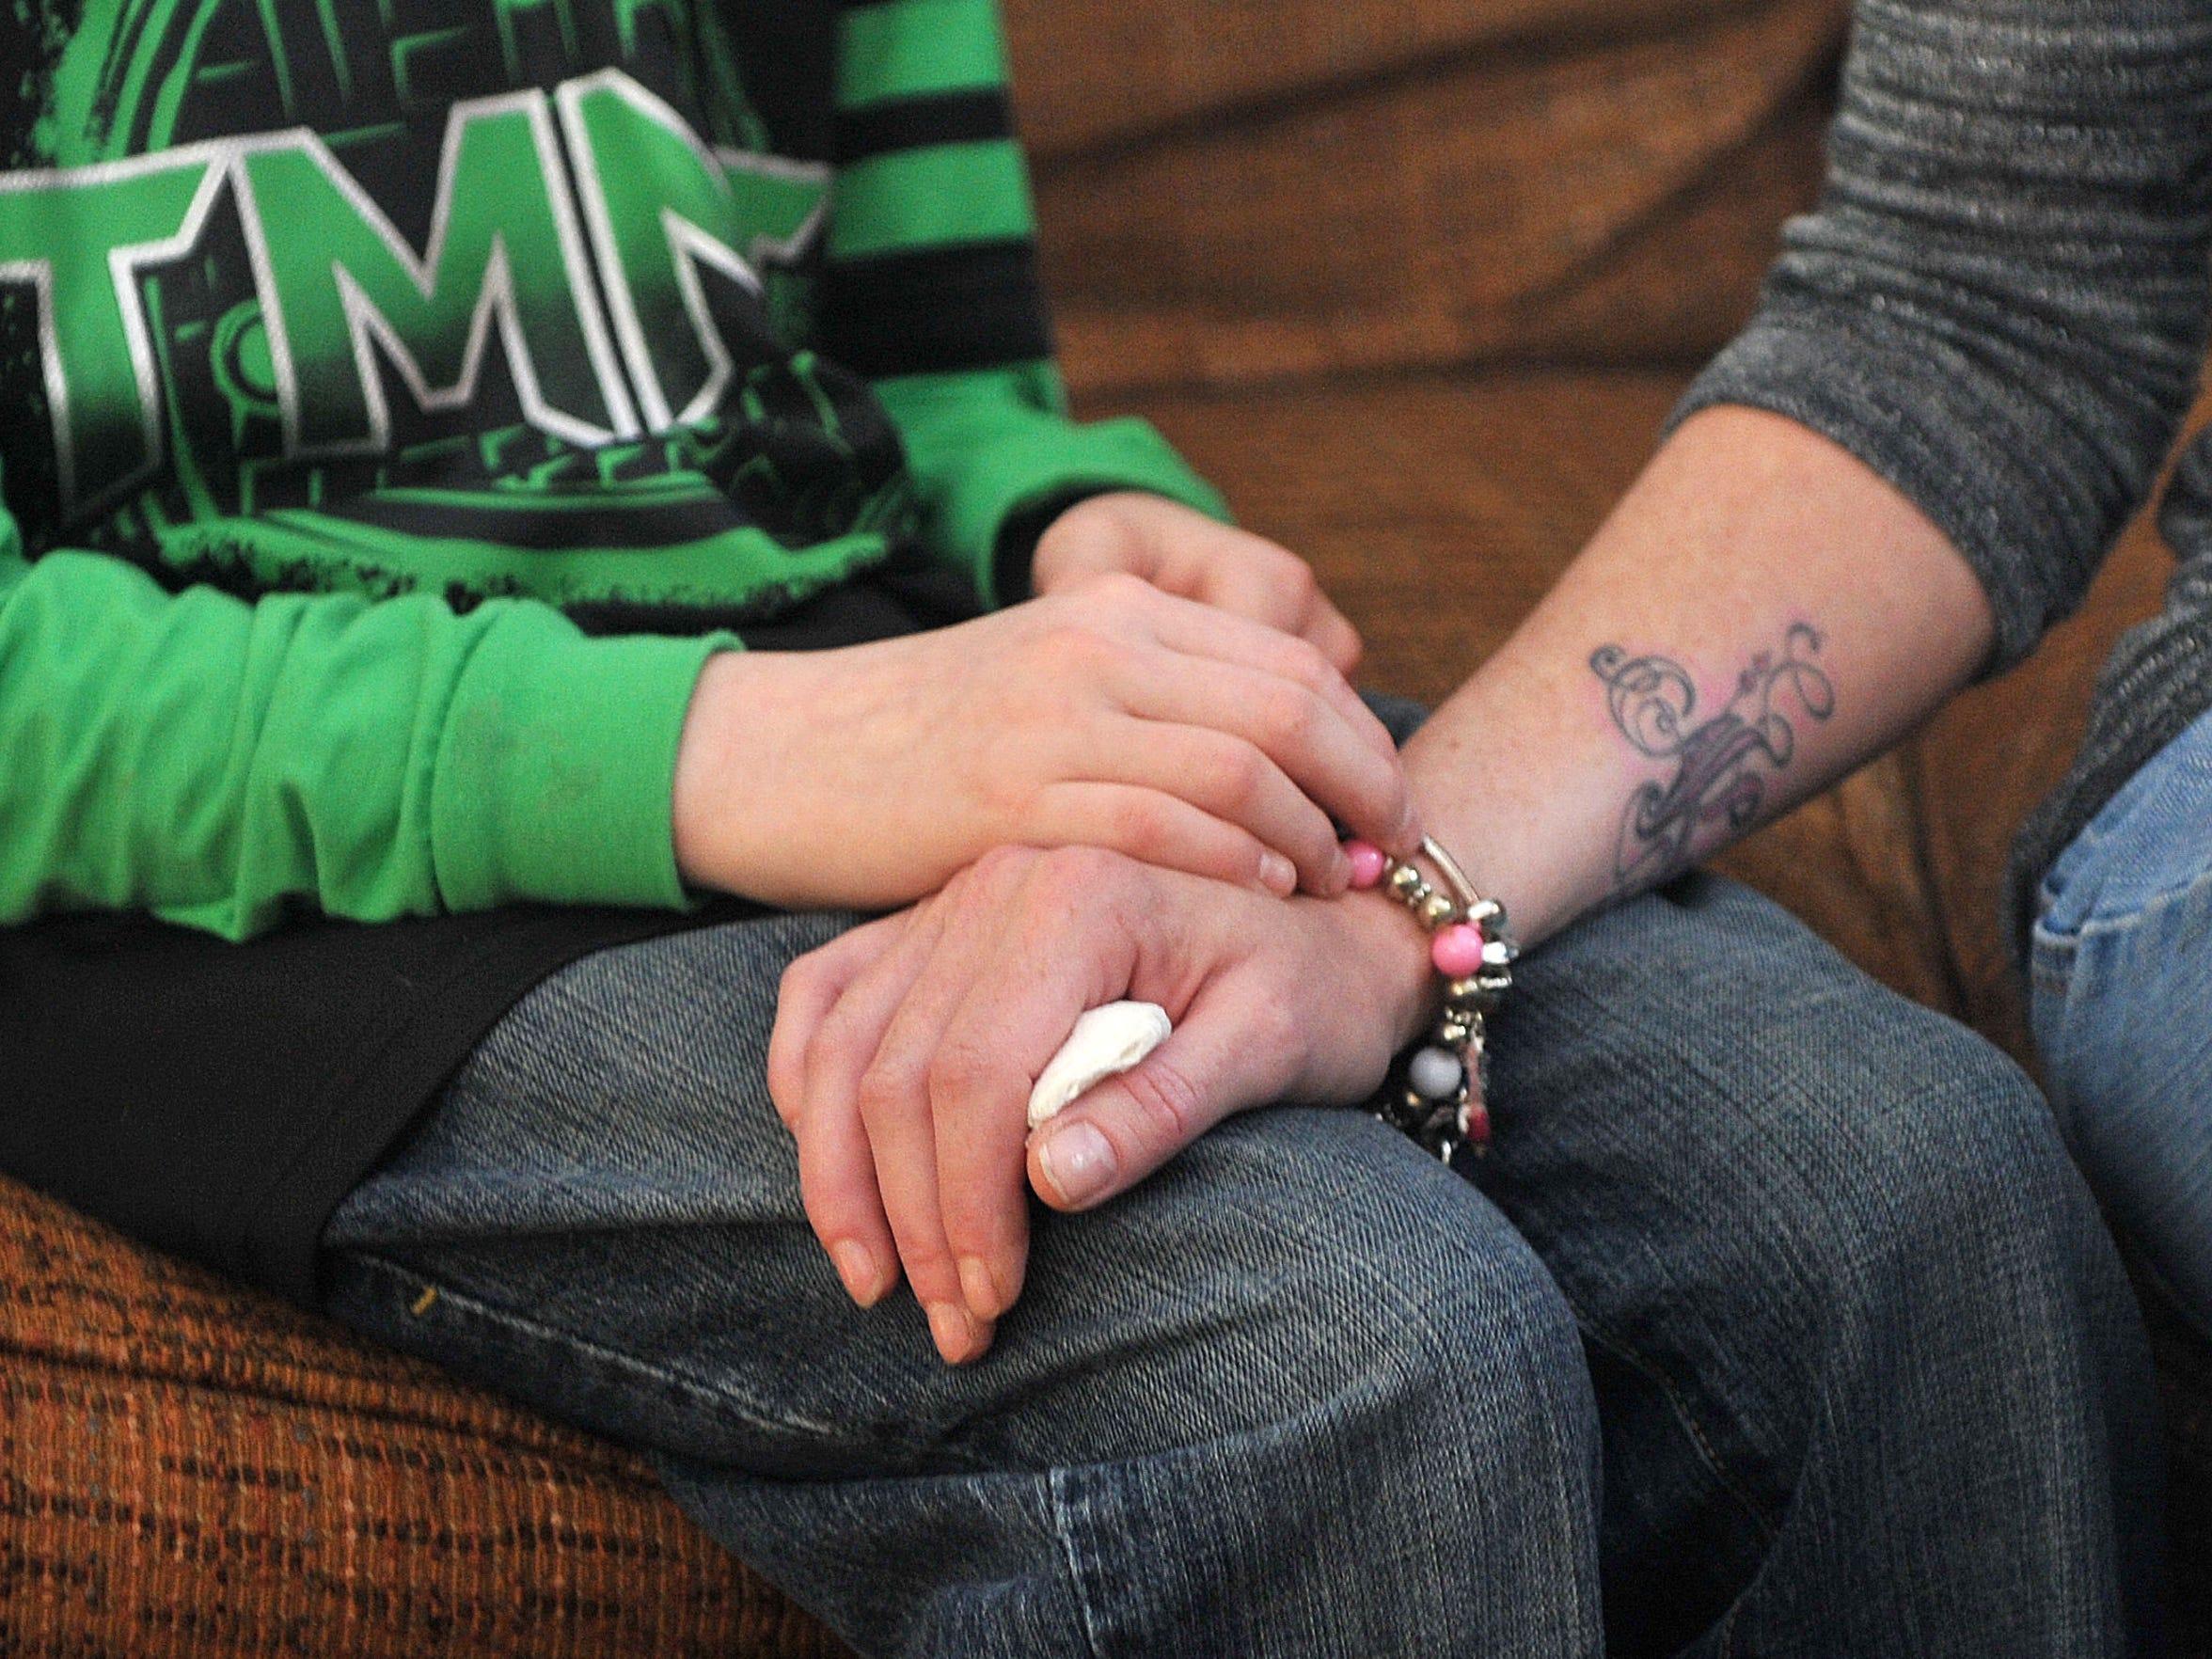 Kristen Shearer rests her hand on her son's knee, Kaleb,